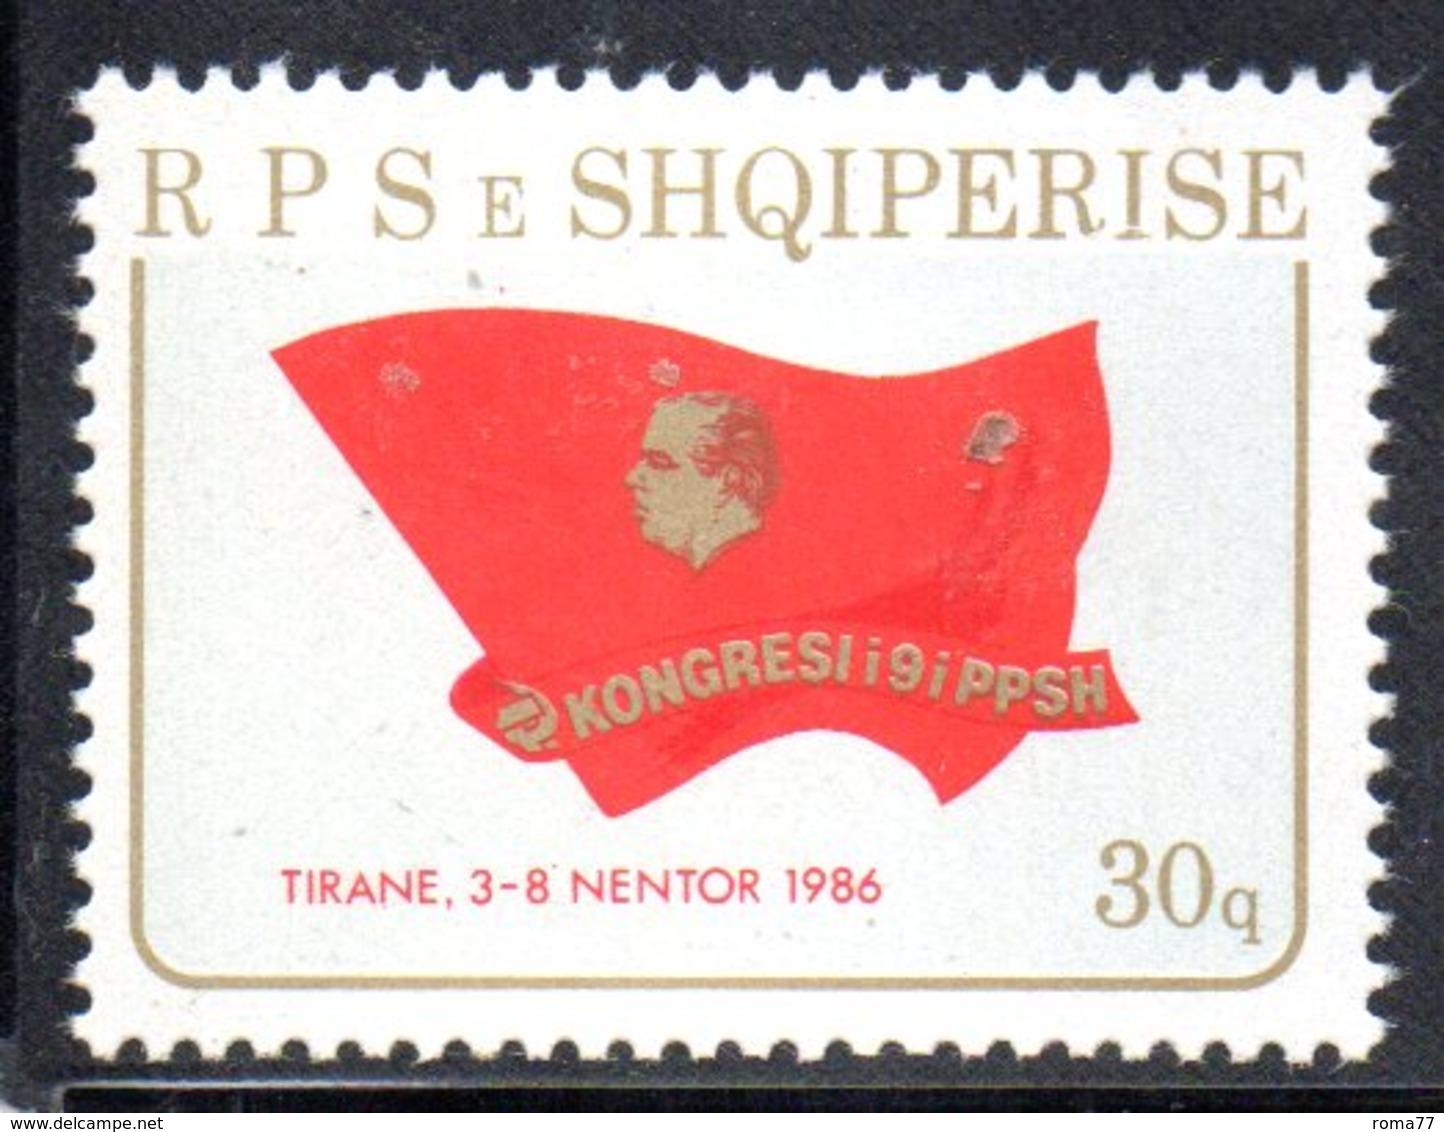 XP4012 - ALBANIA 1986 , Yvert Serie N. 2114  ***   Partito Comunista - Albania